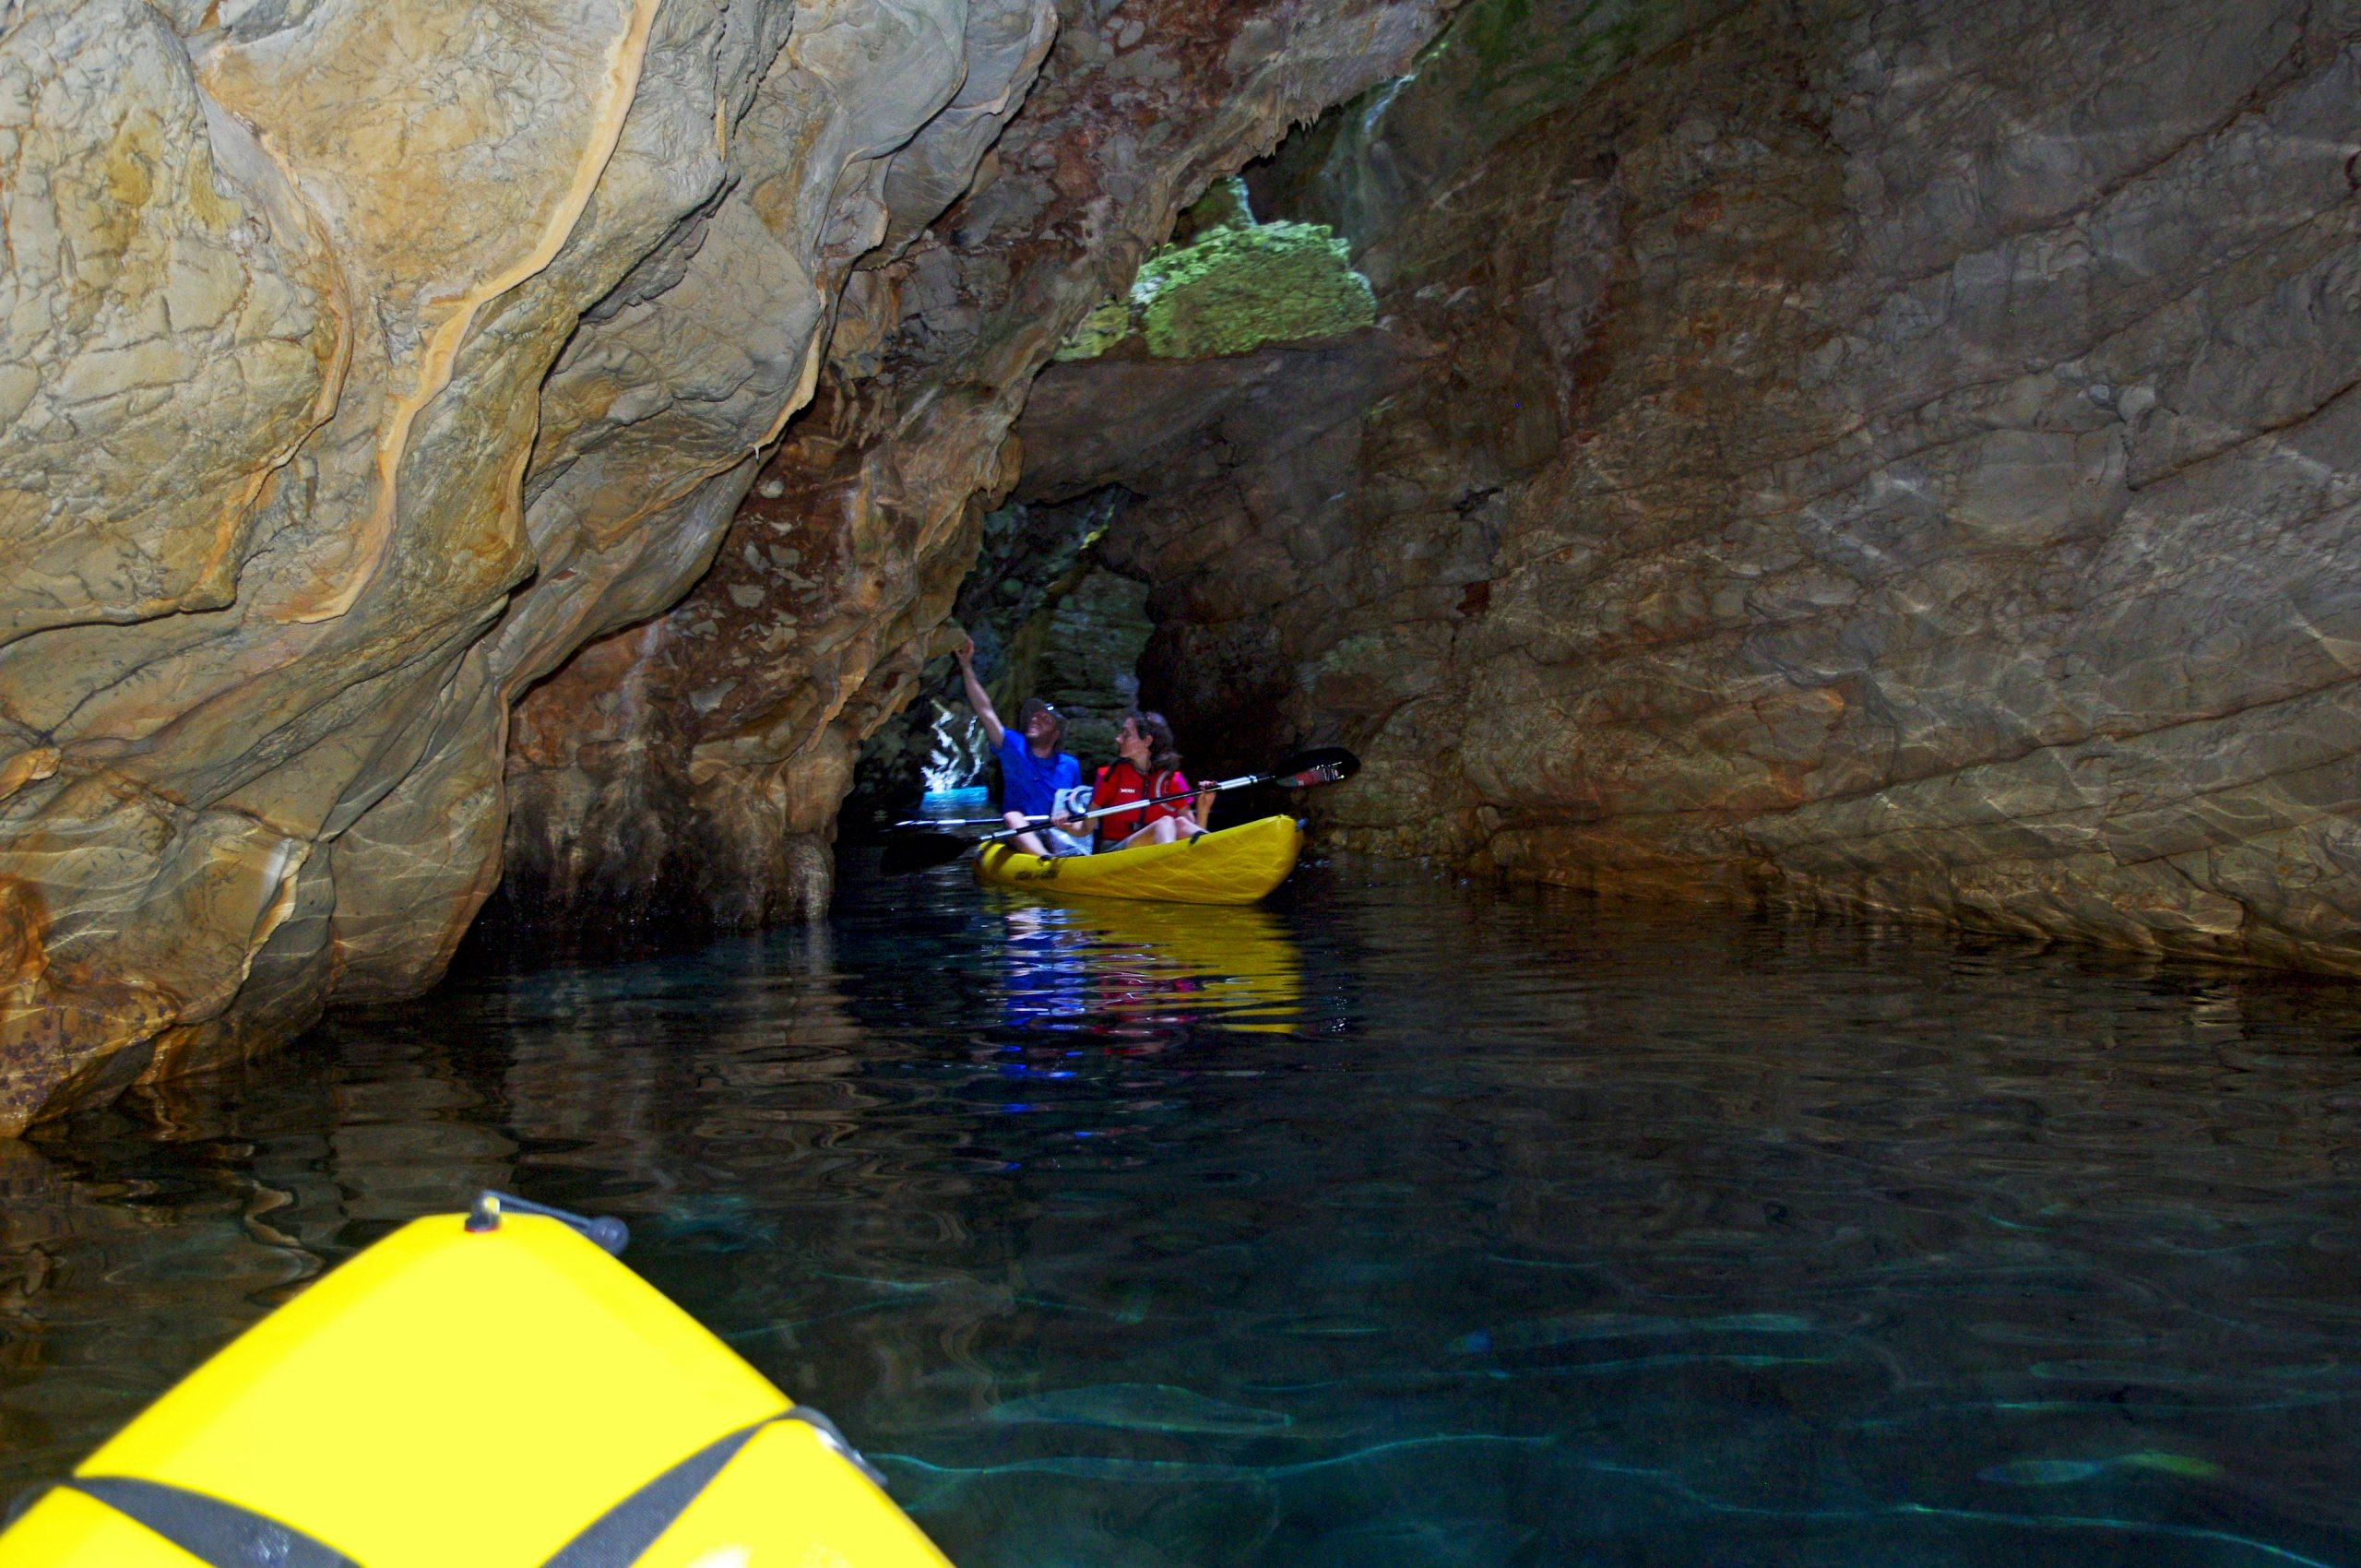 kayaks in cave dugit otok croatia